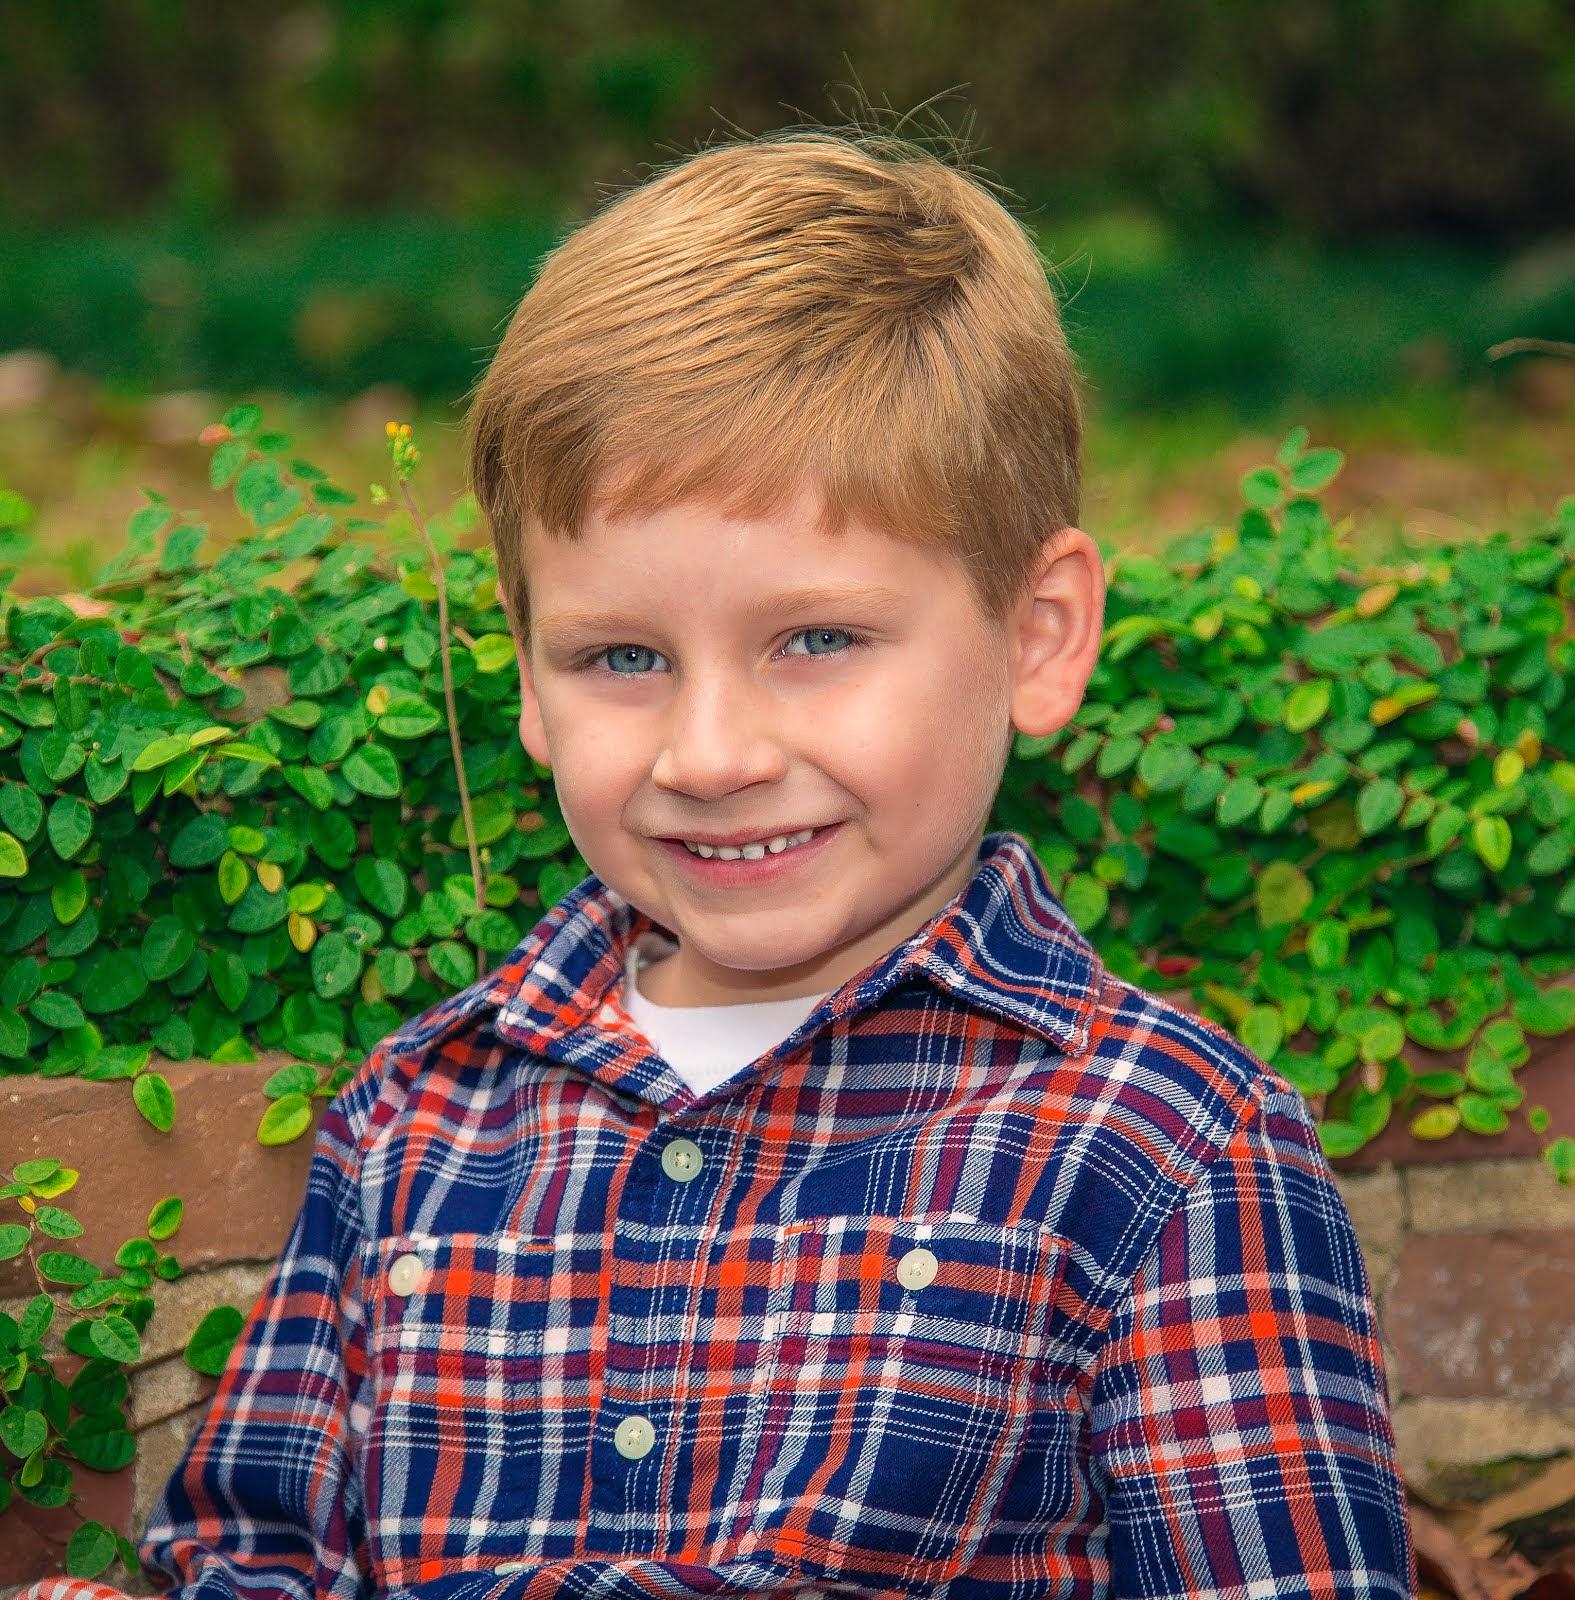 Our Son, Eli